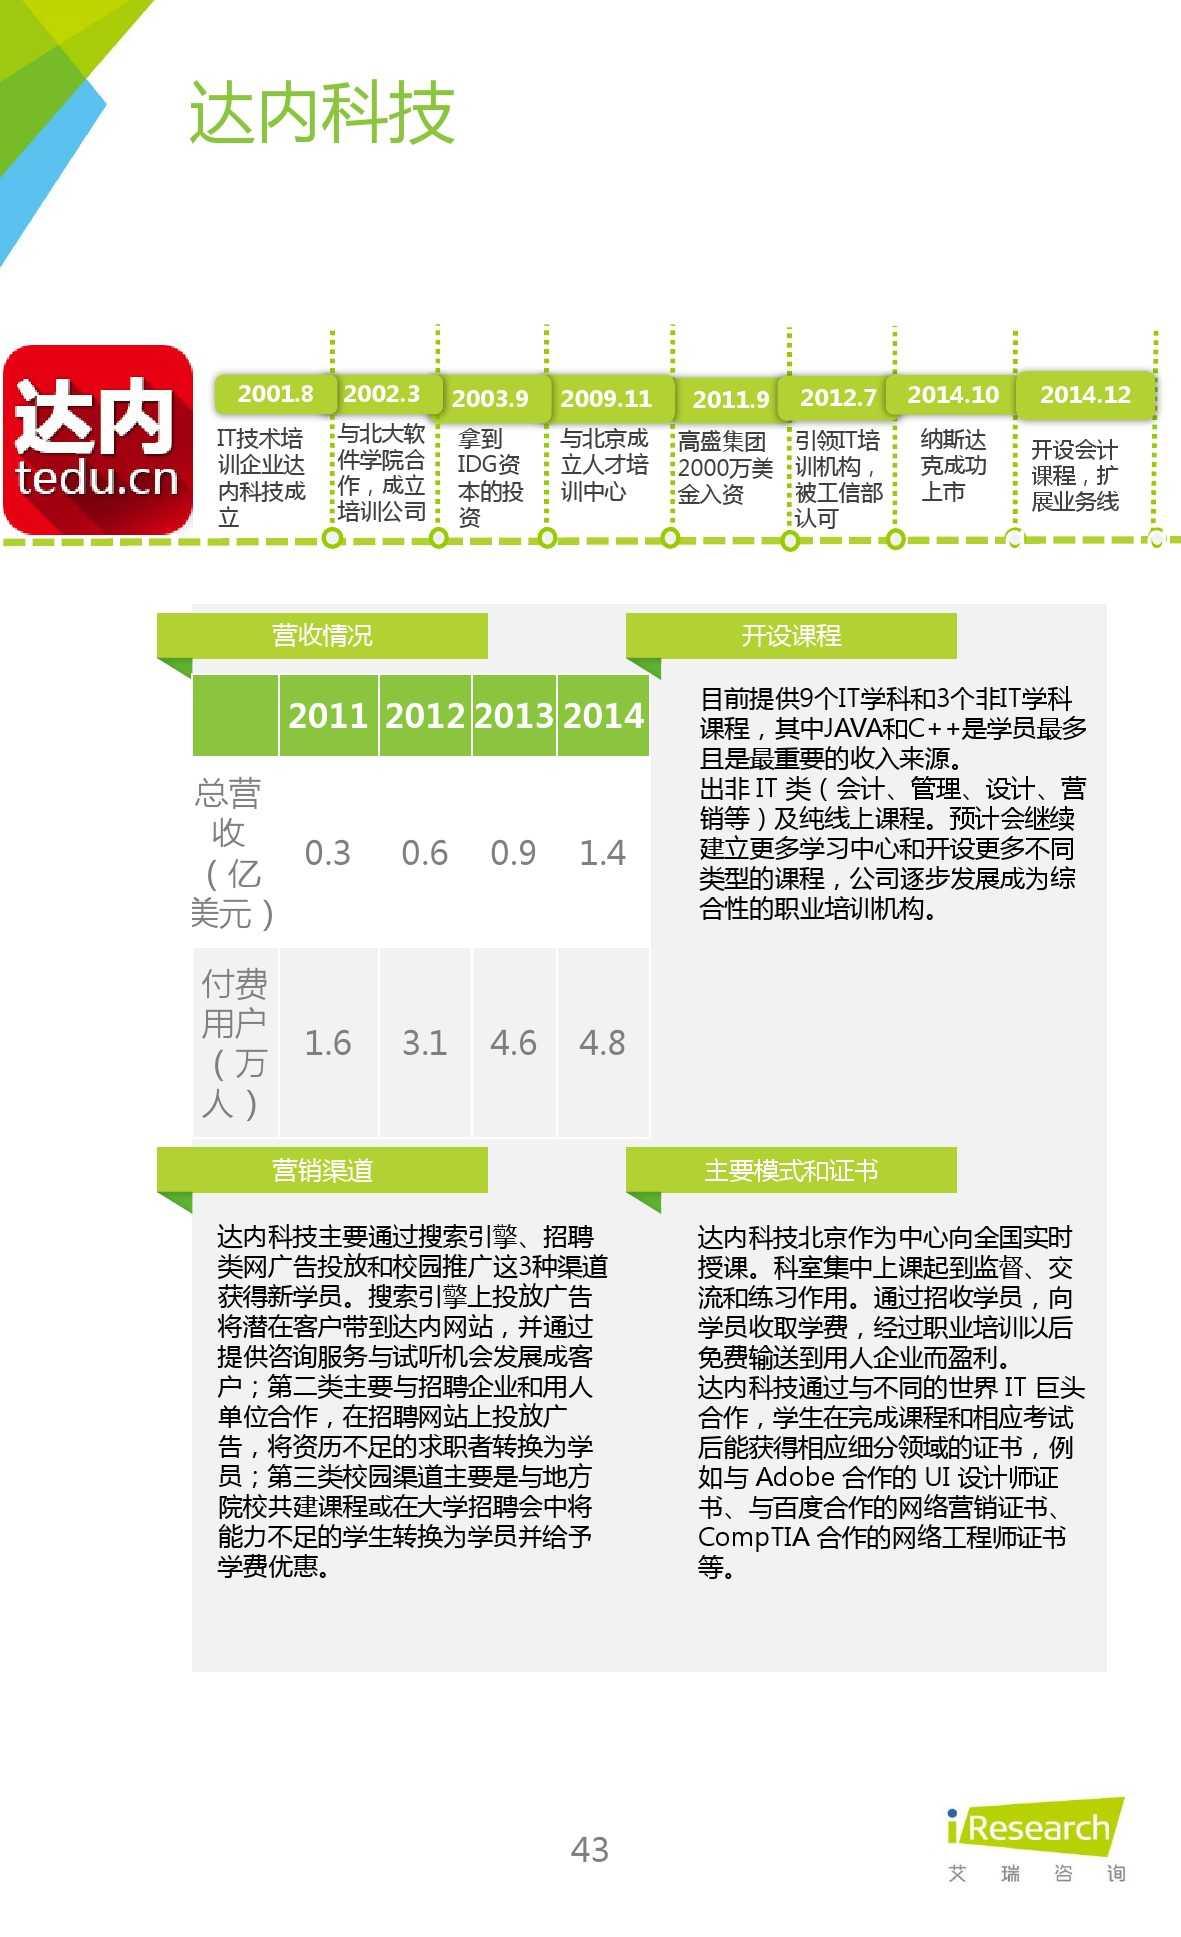 iResearch-2015年中国在线教育平台研究报告_000043